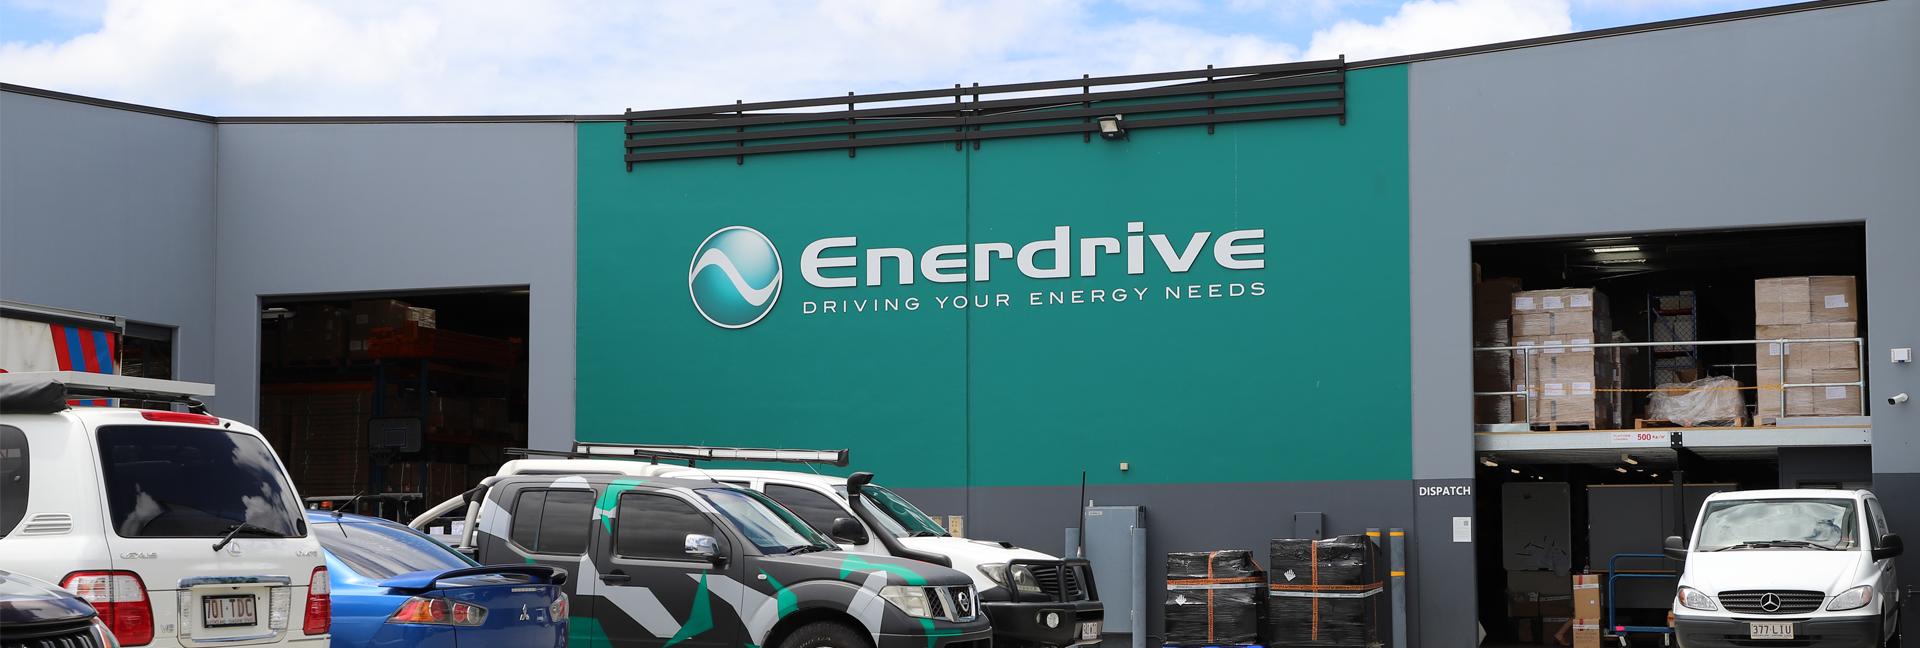 photo of Enerdrive office in Tingalpa, Queensland Australia